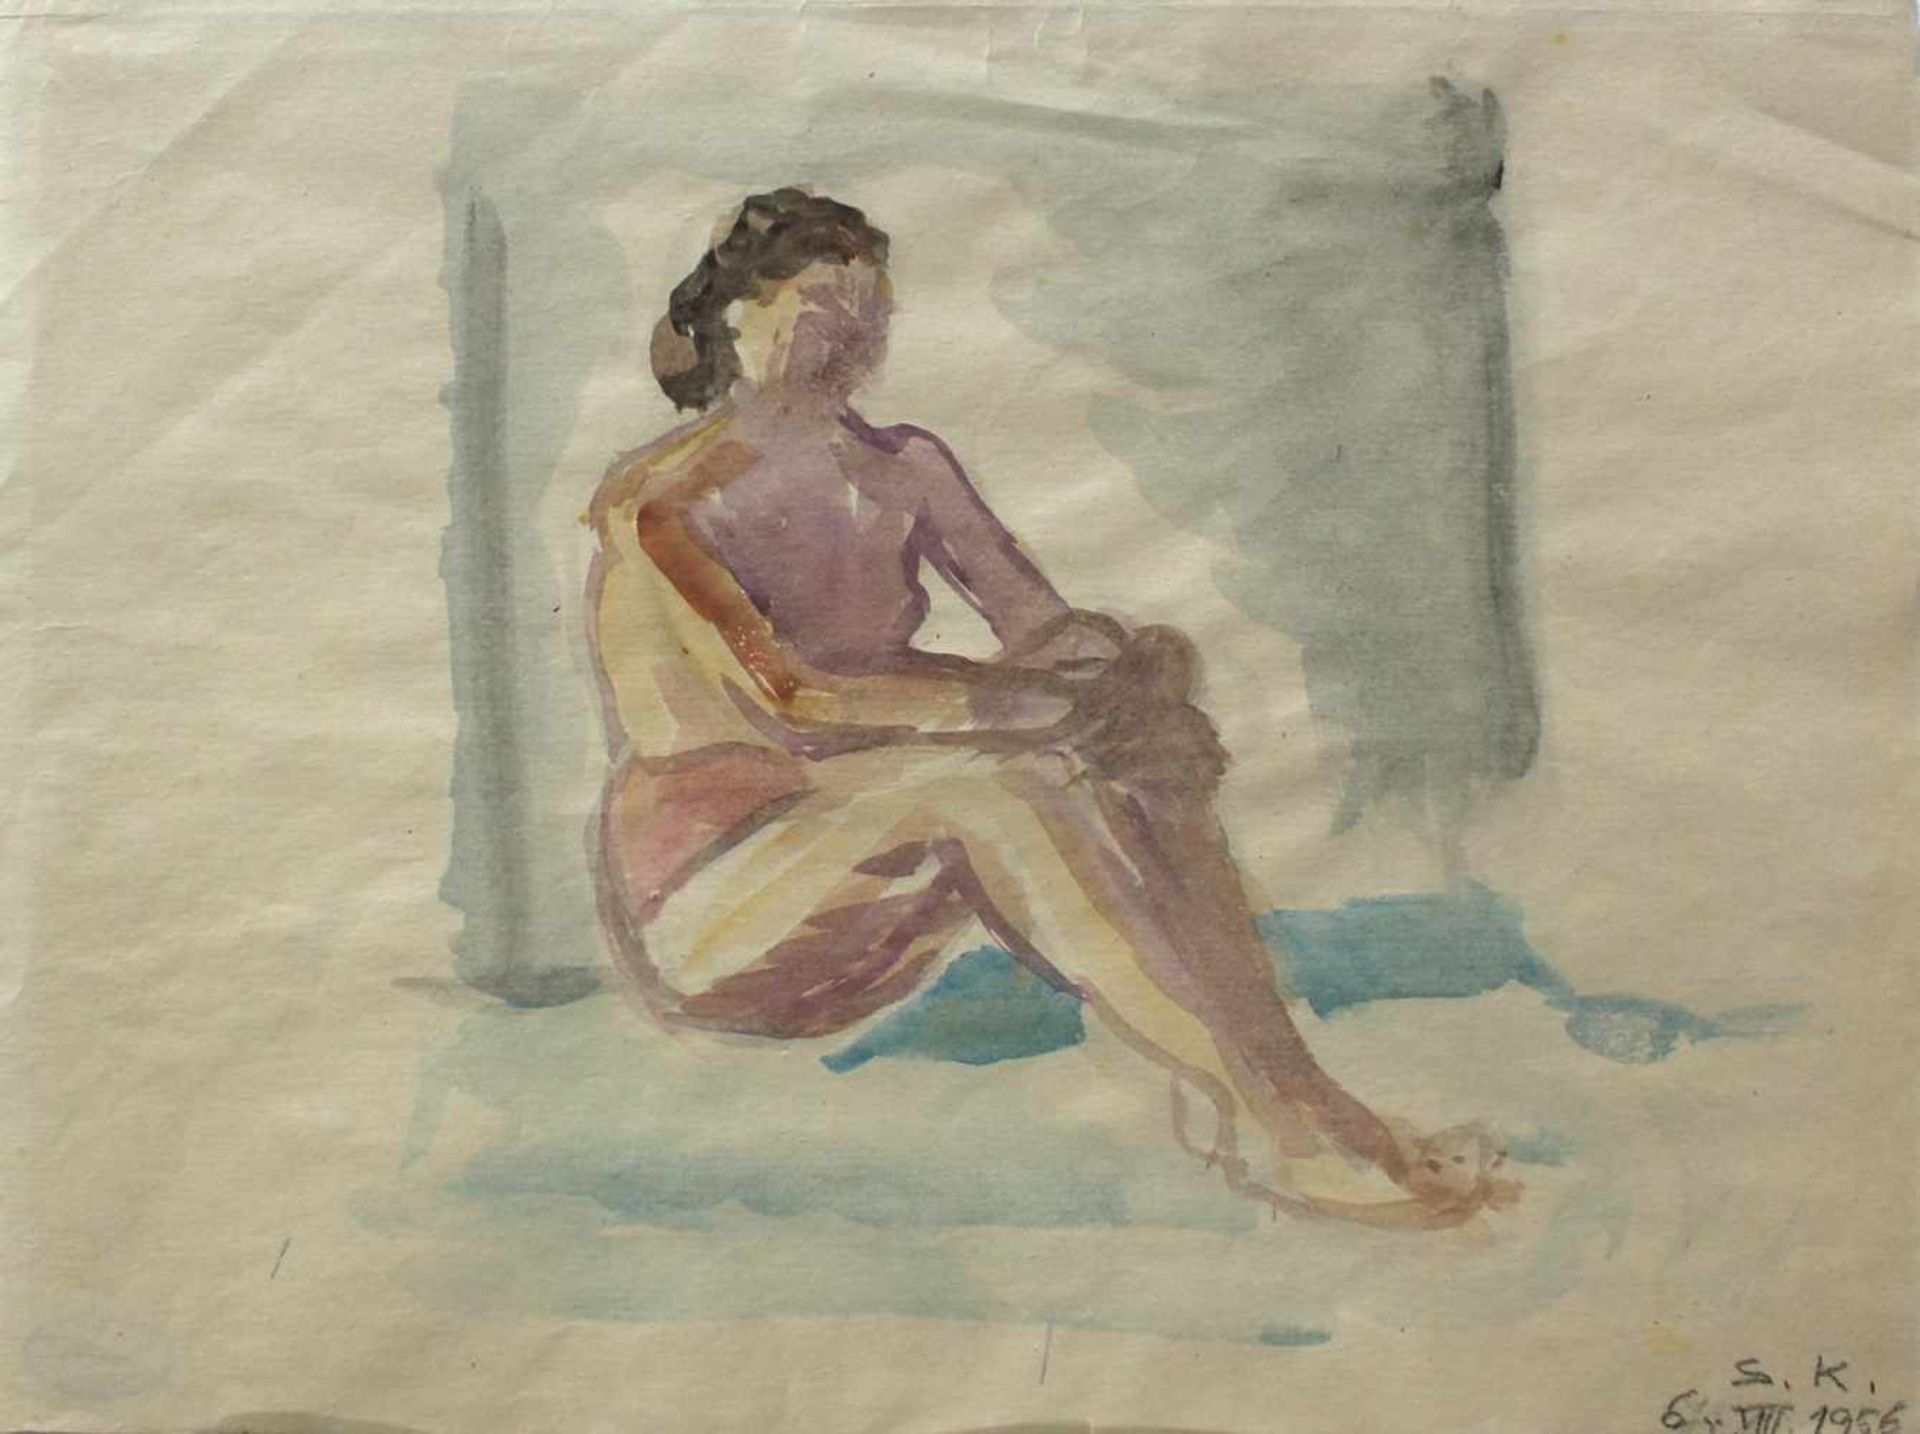 Silvia Koller 1942-2010 Aktstudie 1 1956 Aquarell monogrammiert und datiert (S.K. 6 VIII 1956) 30